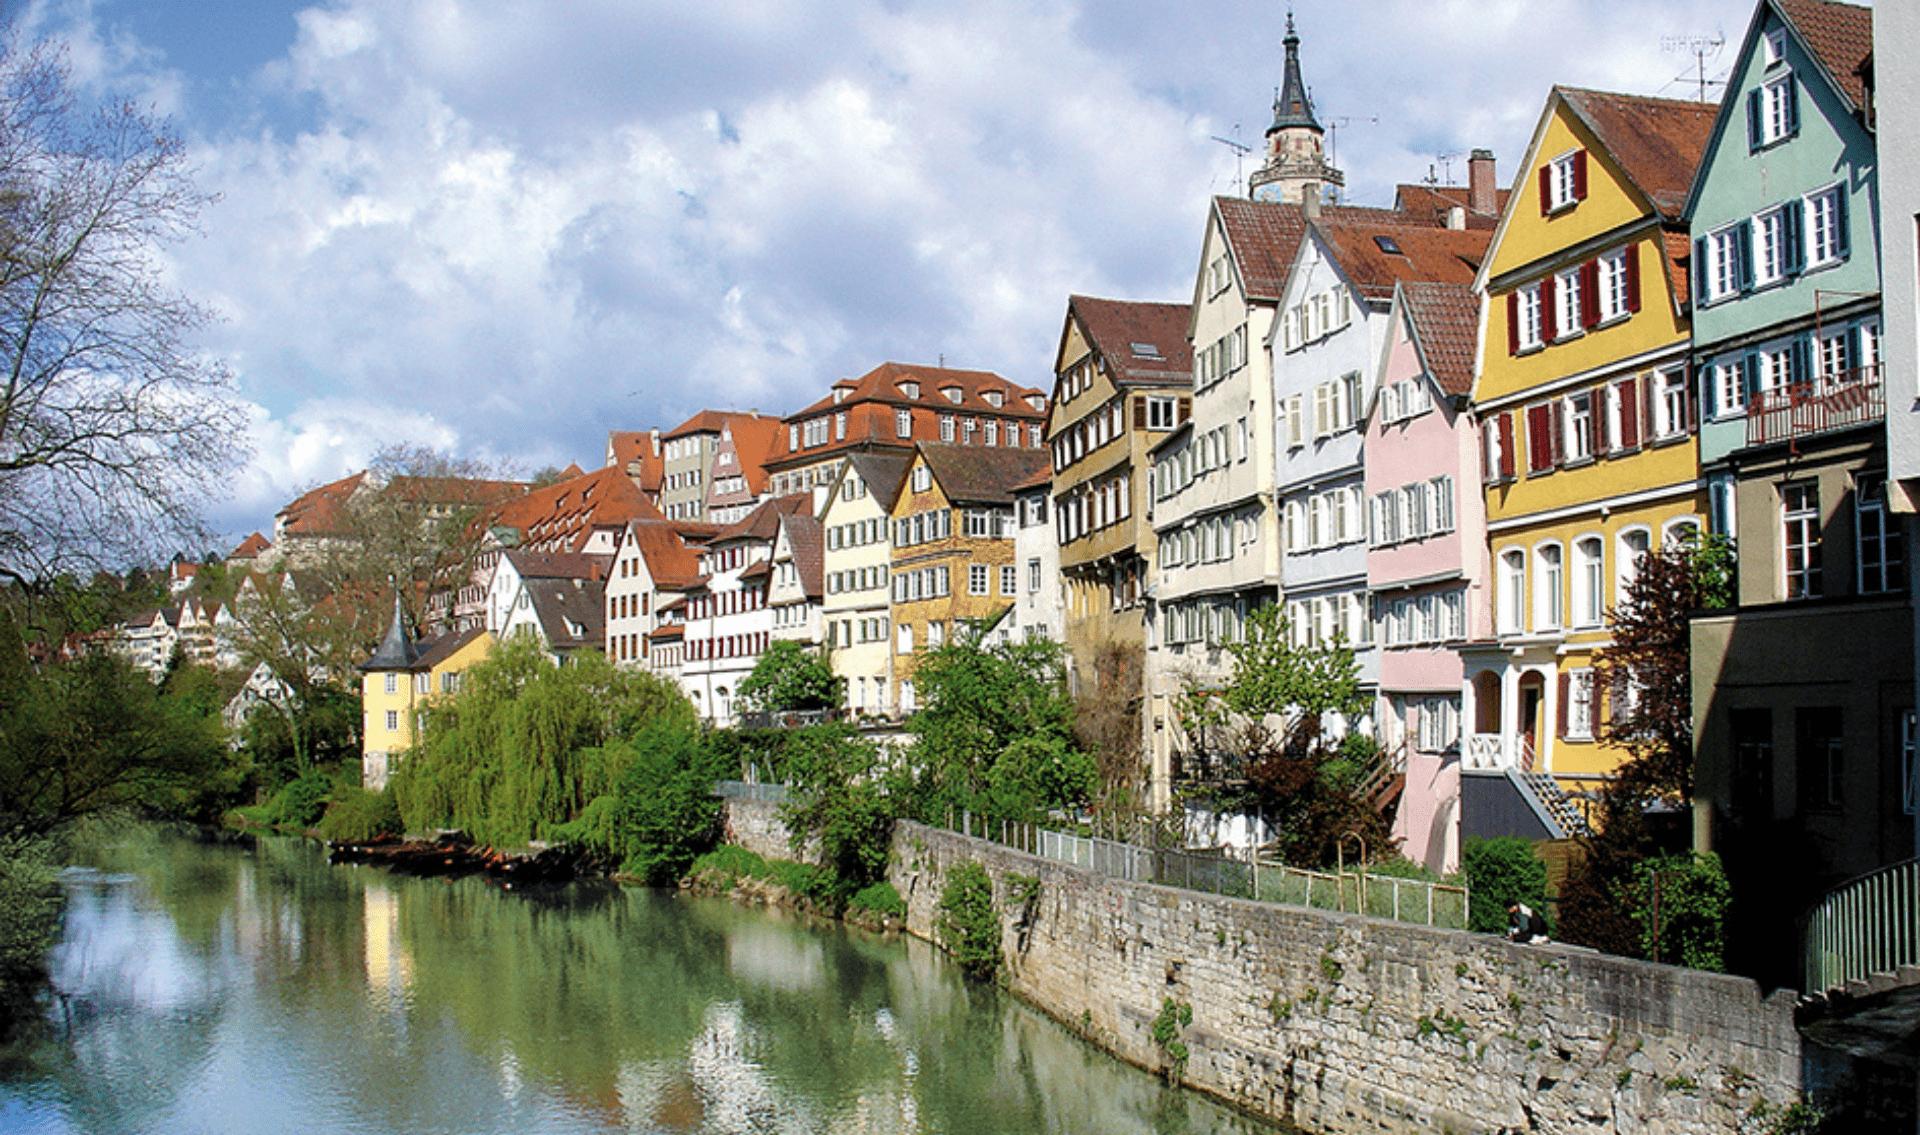 Fietsvakantie De Neckar